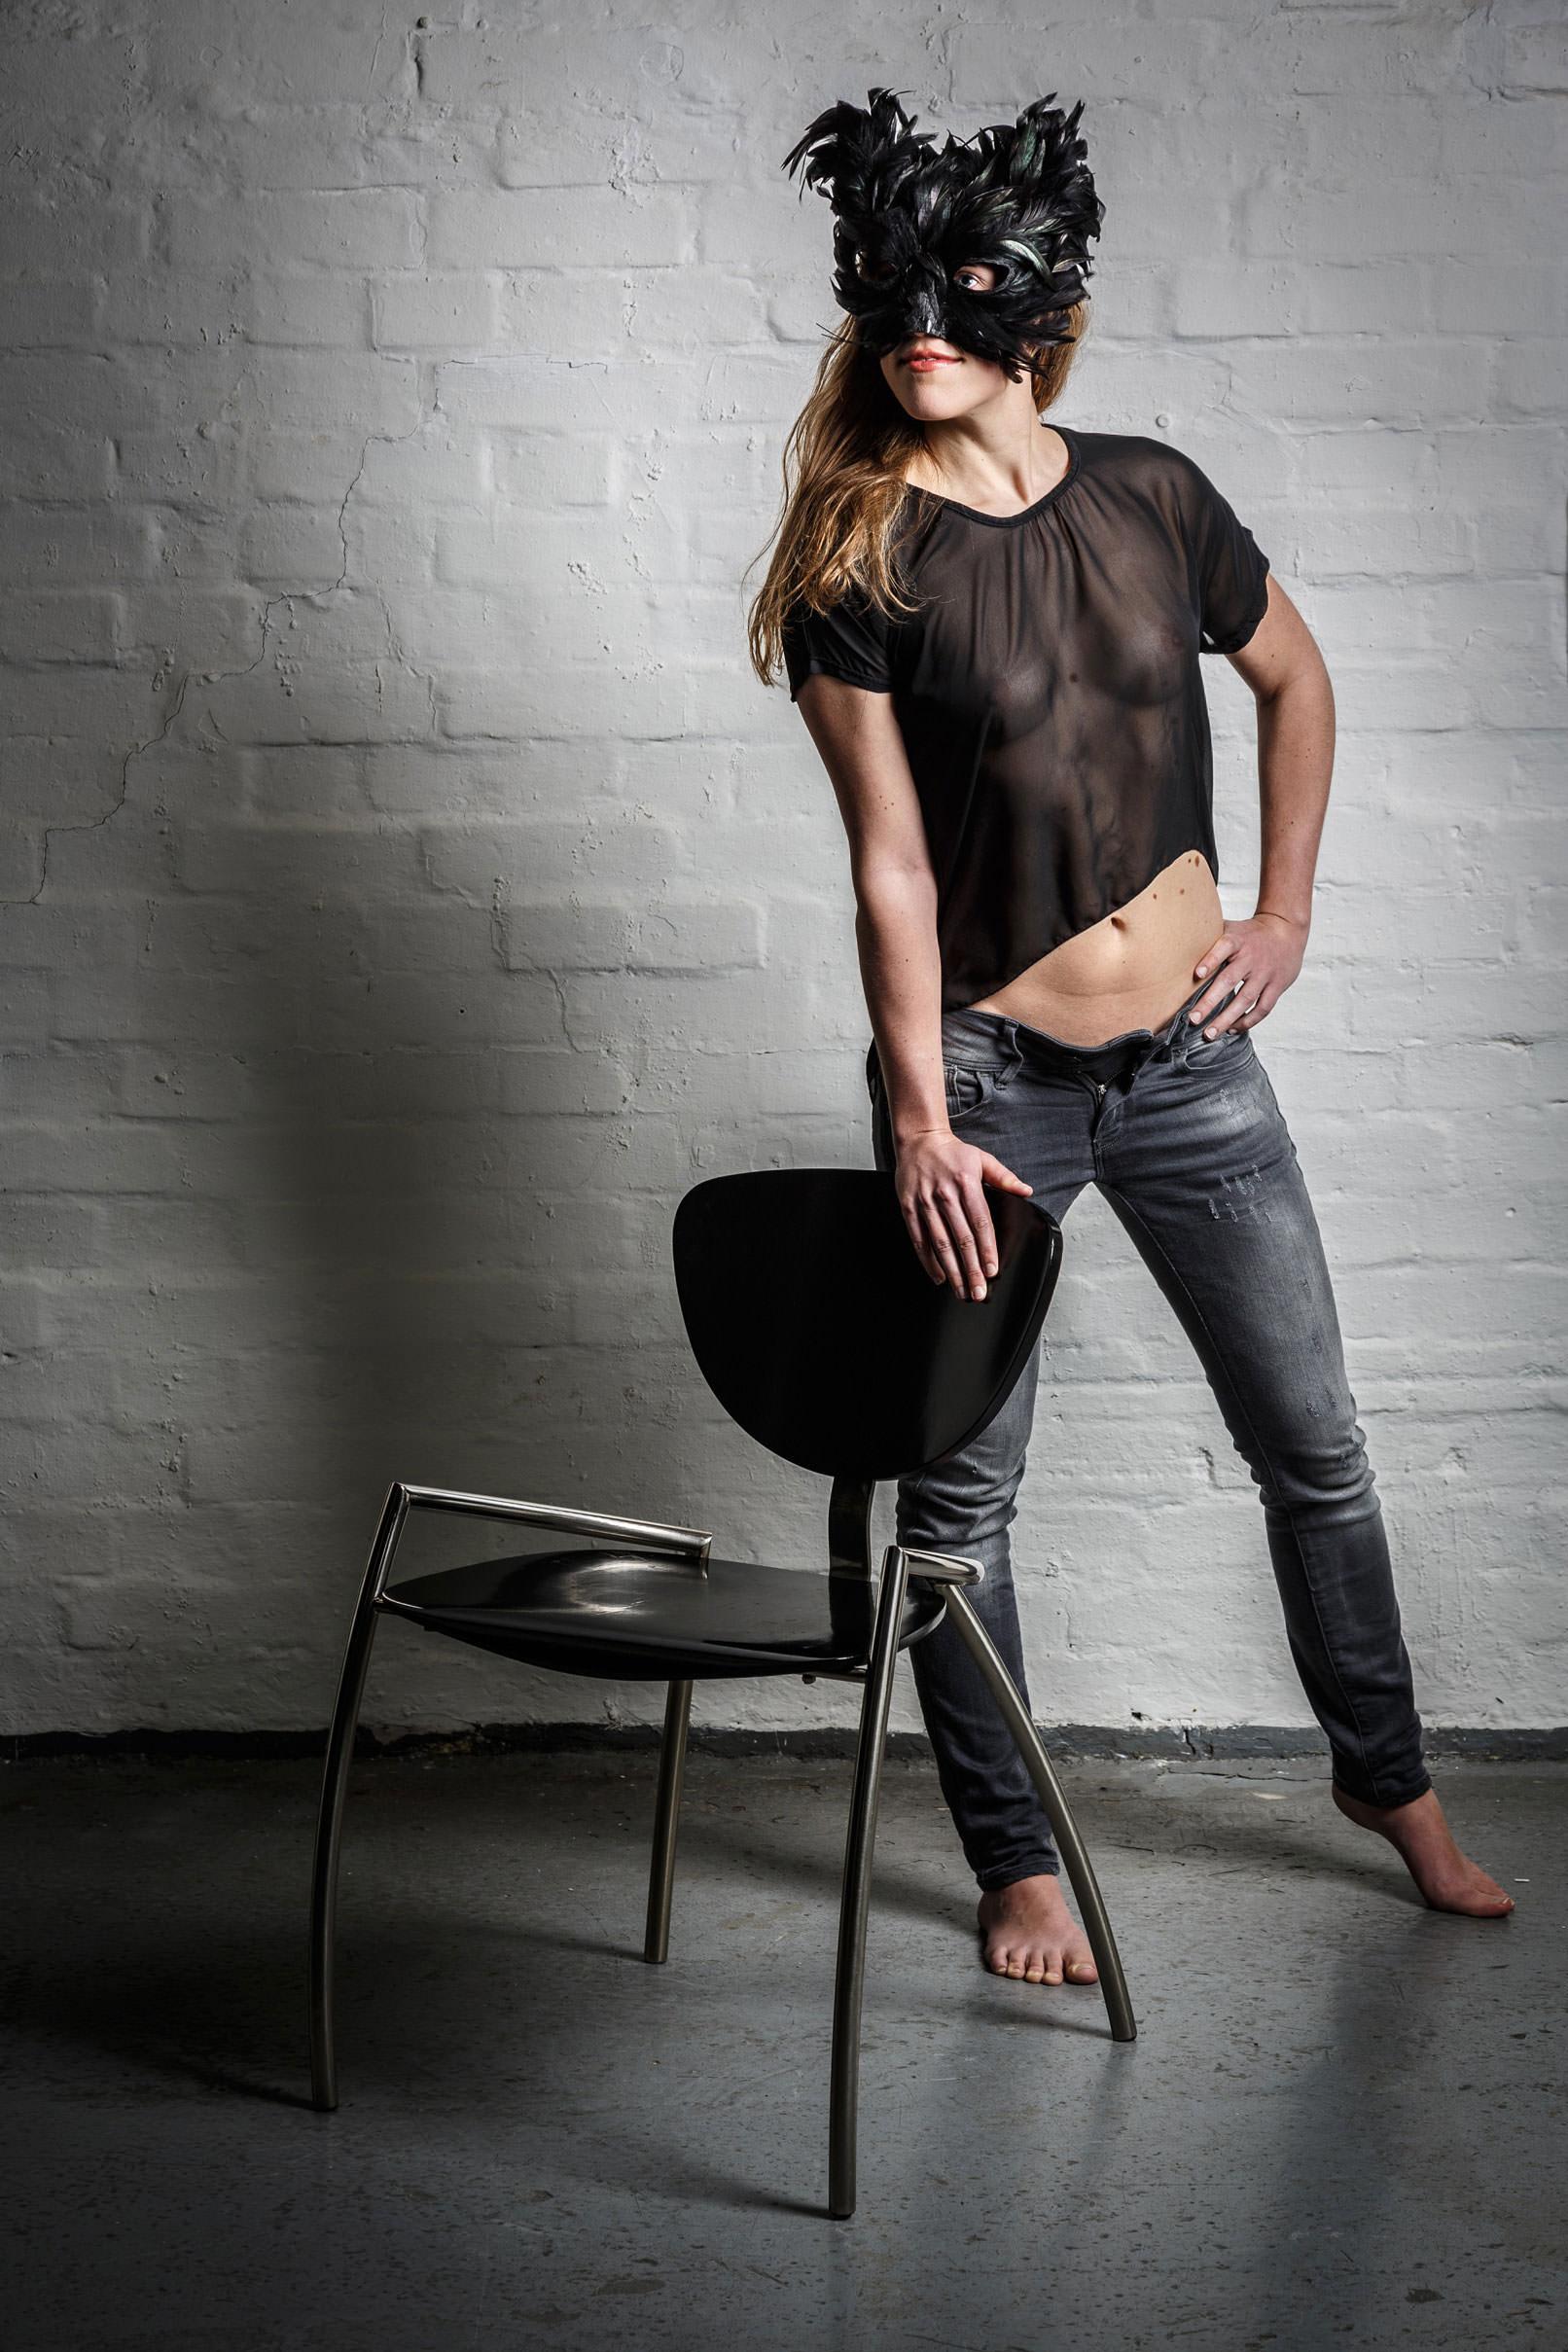 Aktfoto einer Frau